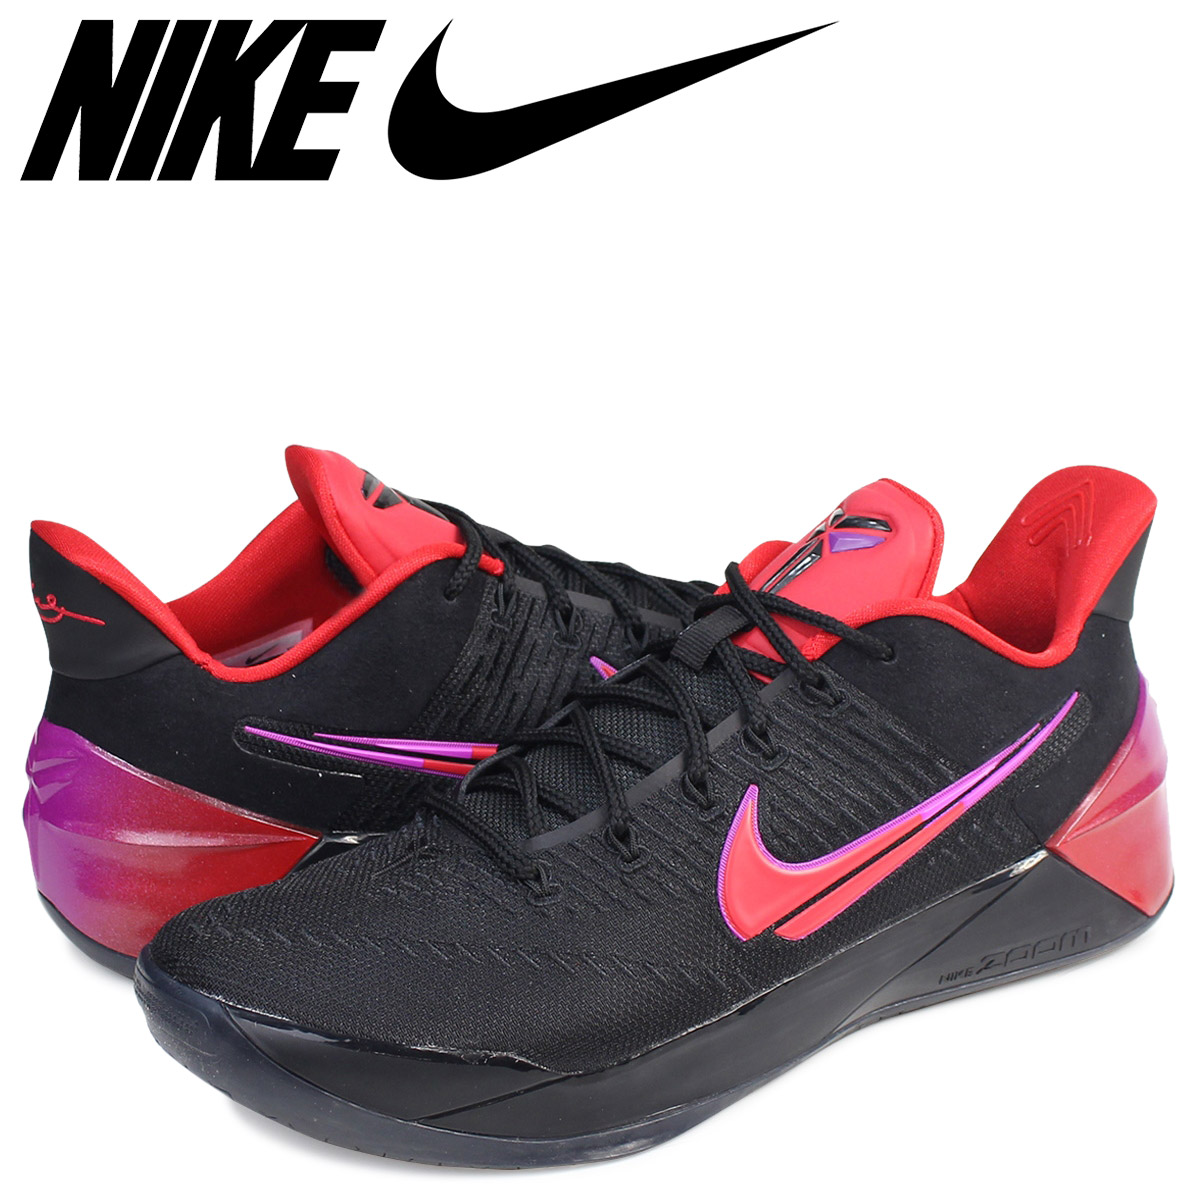 sale retailer a81ea c45ed NIKE Nike Corby sneakers NIKE KOBE AD 852,425-004 men's shoes black